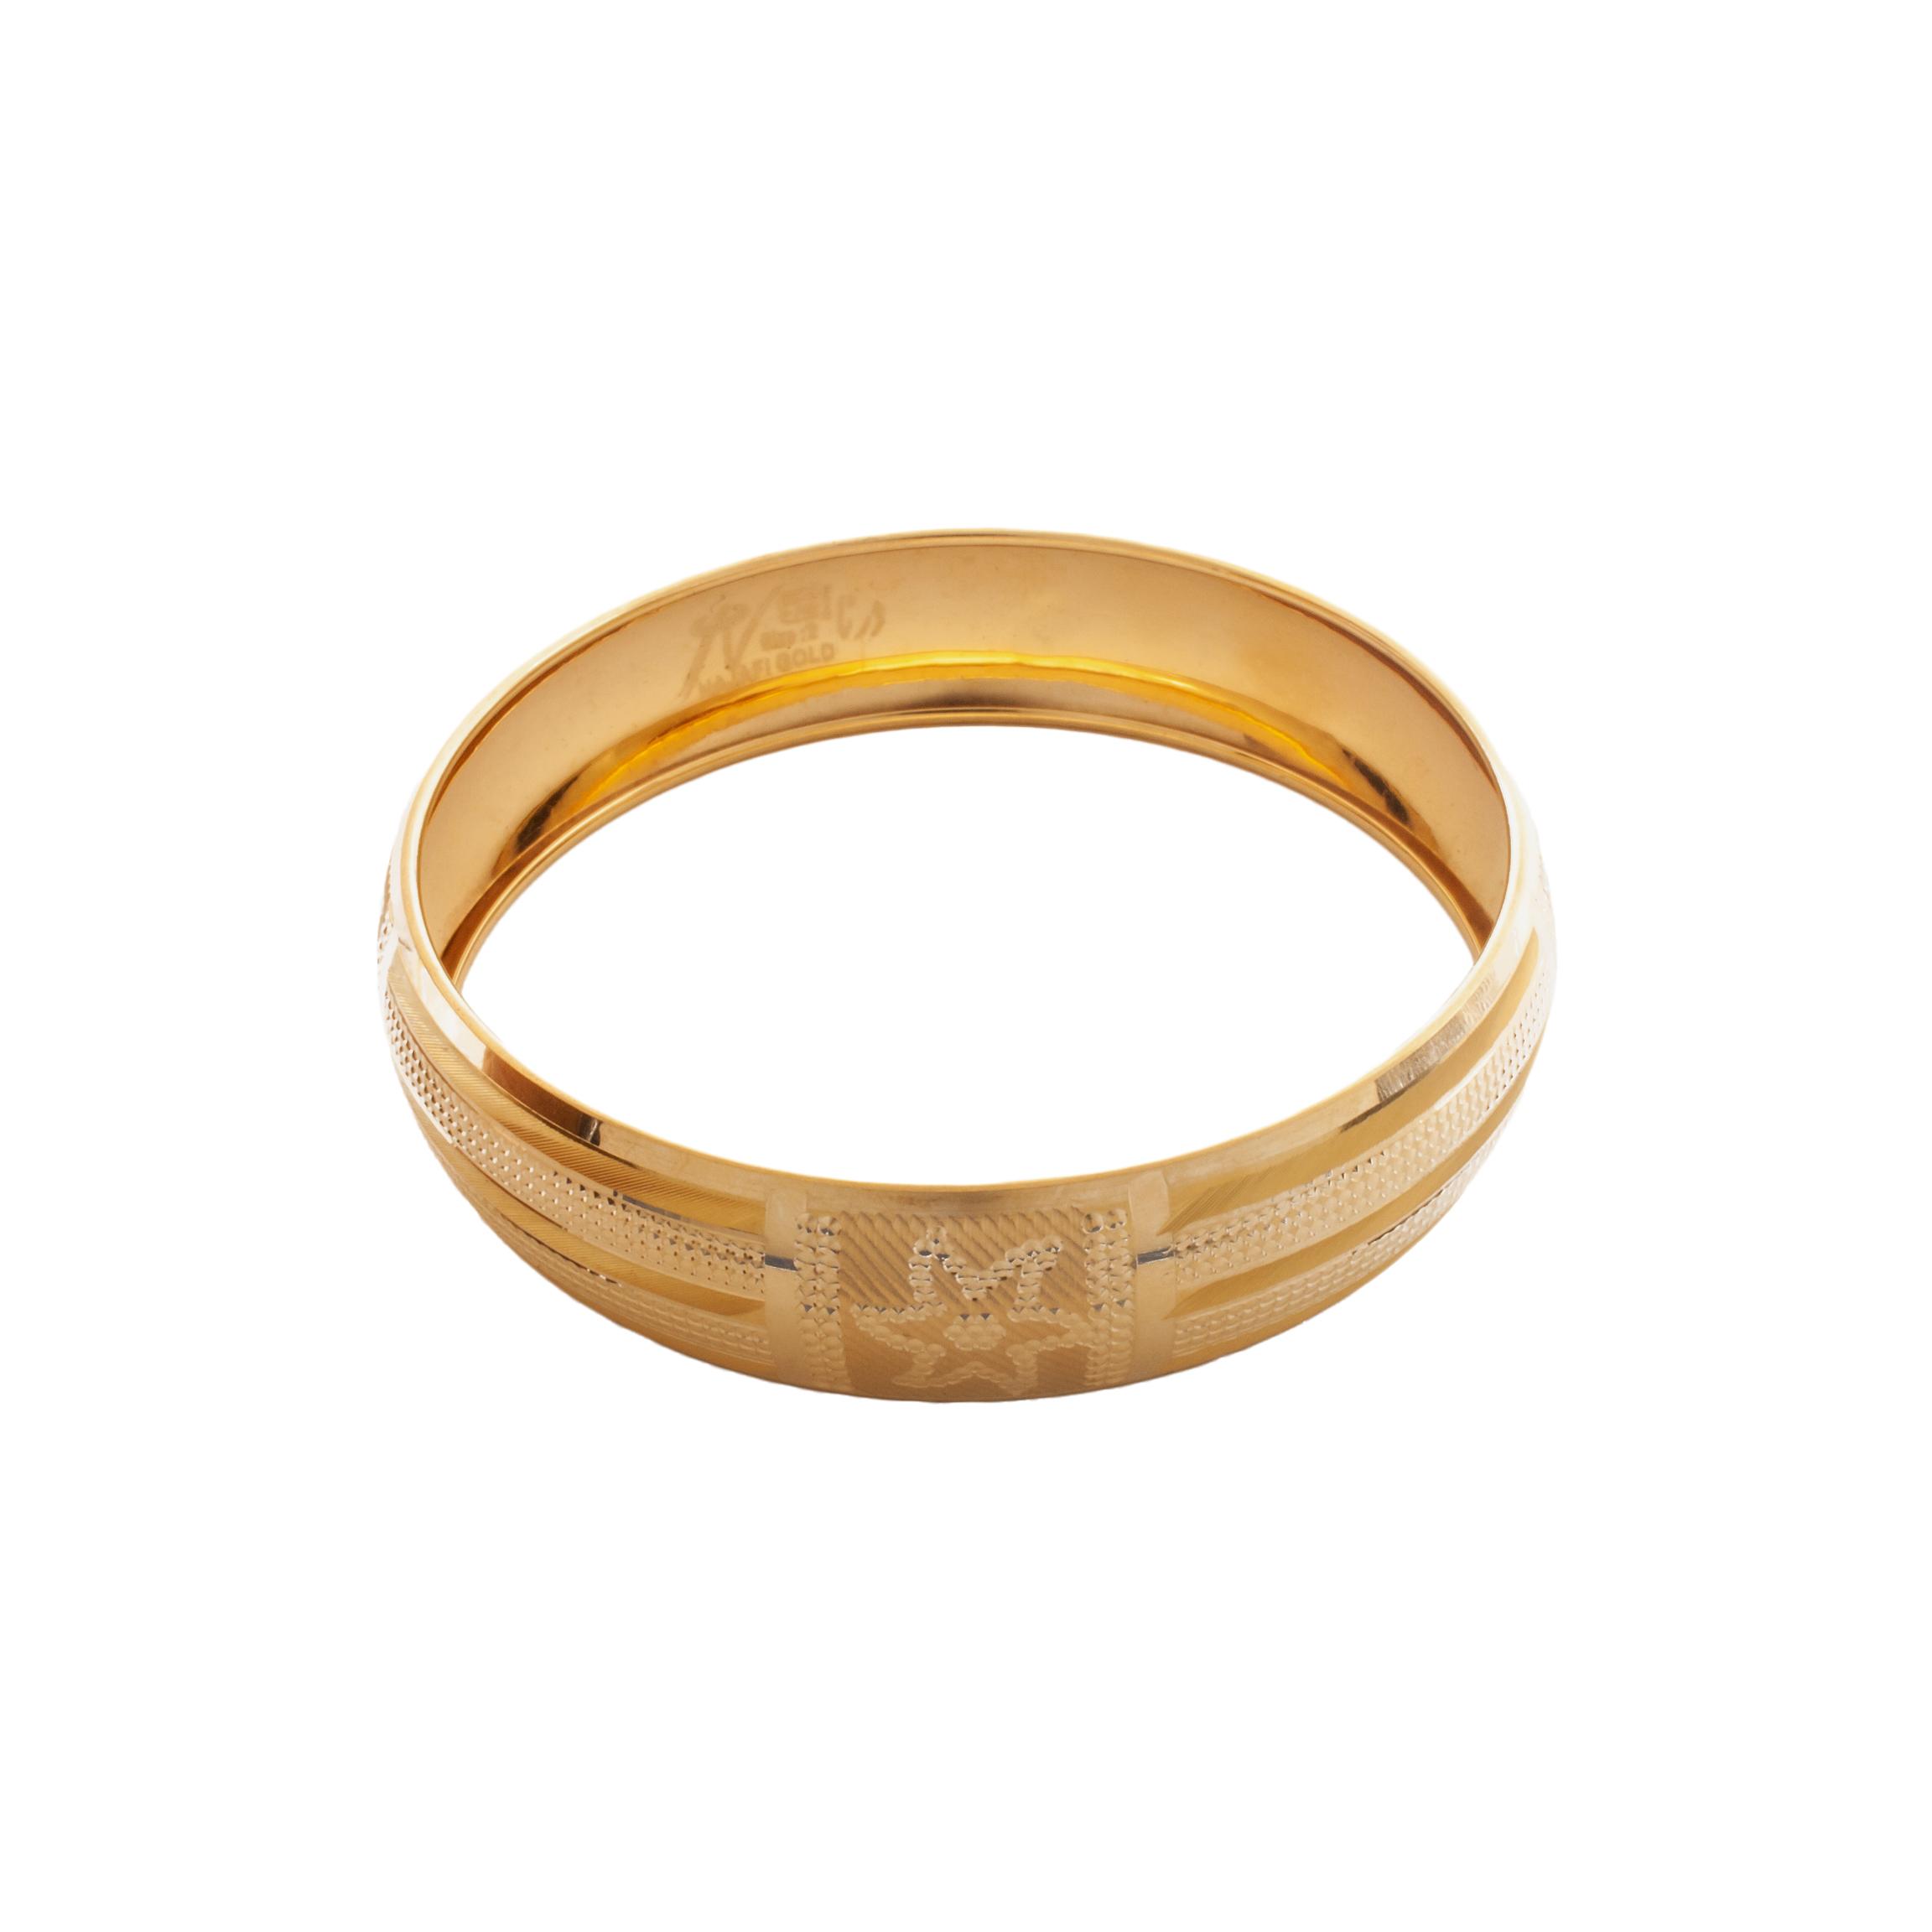 النگو طلا ۱۸ عیار زنانه دُرج مدل VB06-2